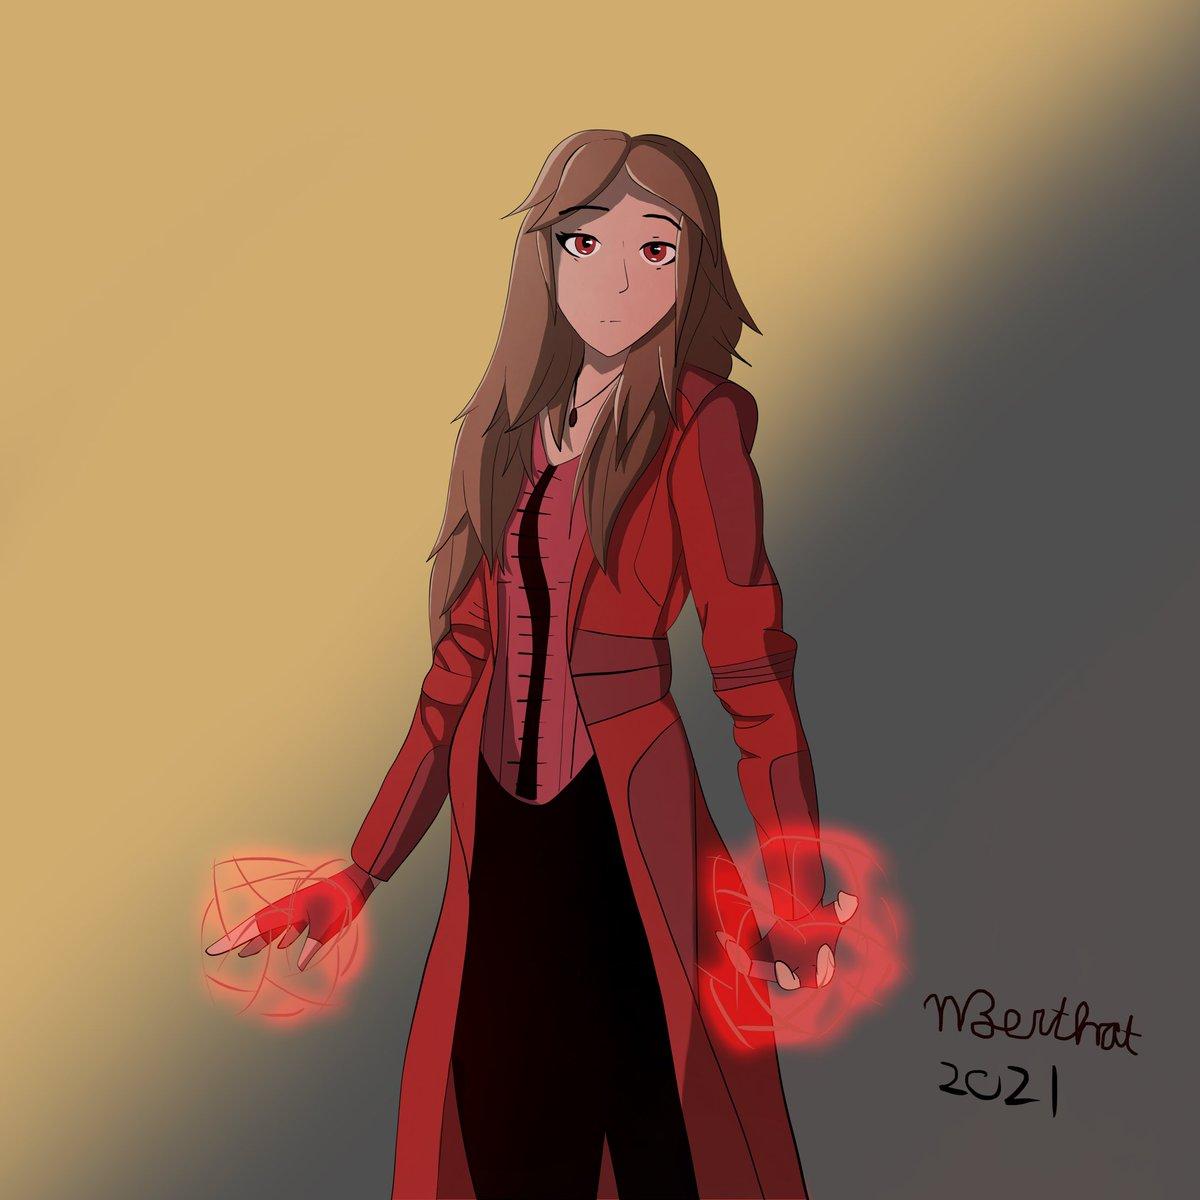 In celebration of #WandaVision, did a quick fanart of Wanda Maximoff herself! One of my favorite Marvel characters, hope the show is good! #MCU #Wanda #fanart #art #digitalart